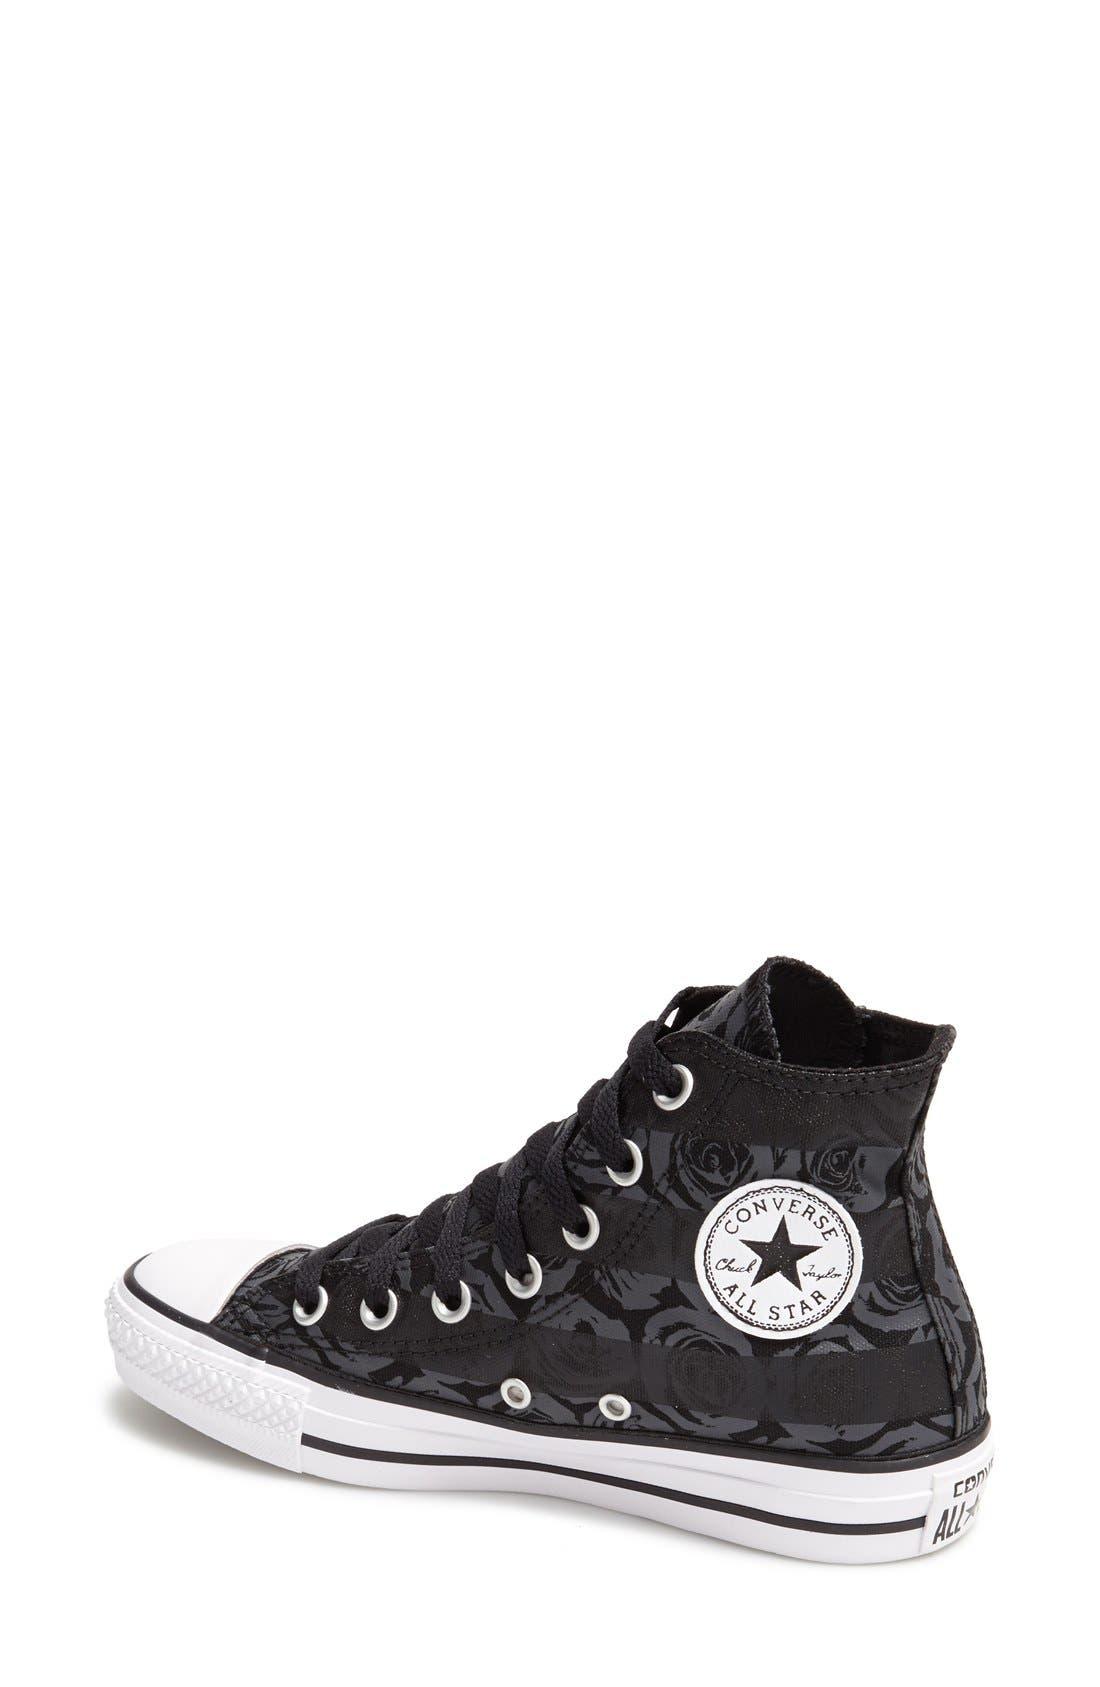 Alternate Image 2  - Converse Chuck Taylor® All Star® Rose Print High Top Sneaker (Women)